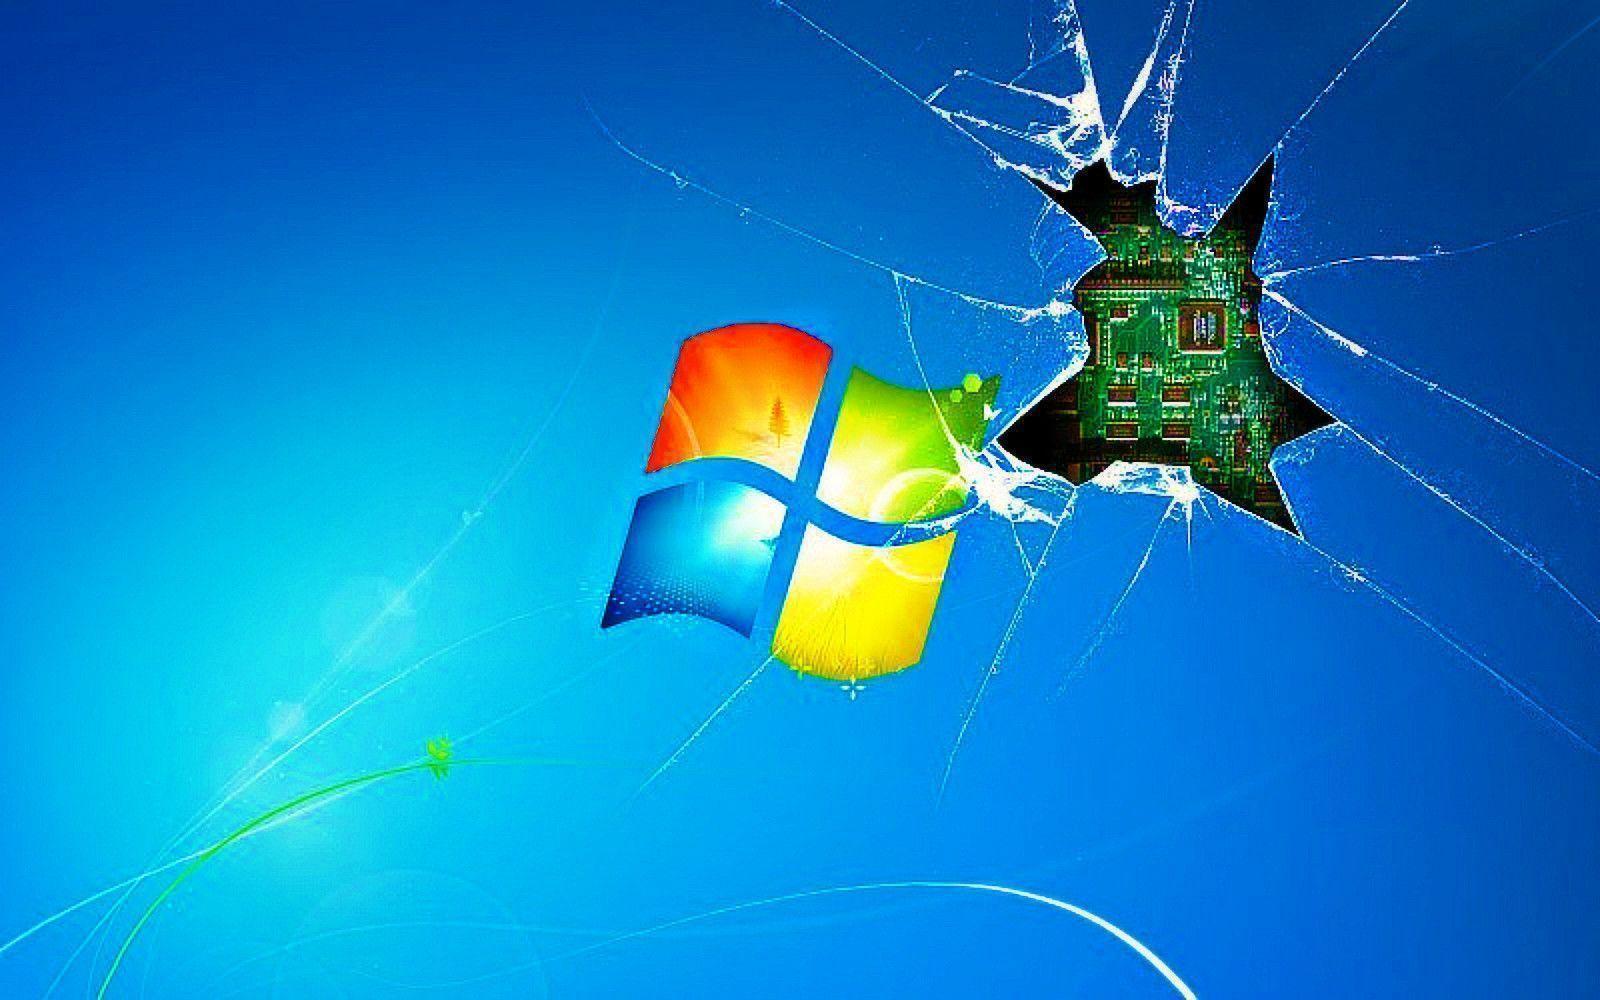 broken wallpaper windows 8 - photo #15